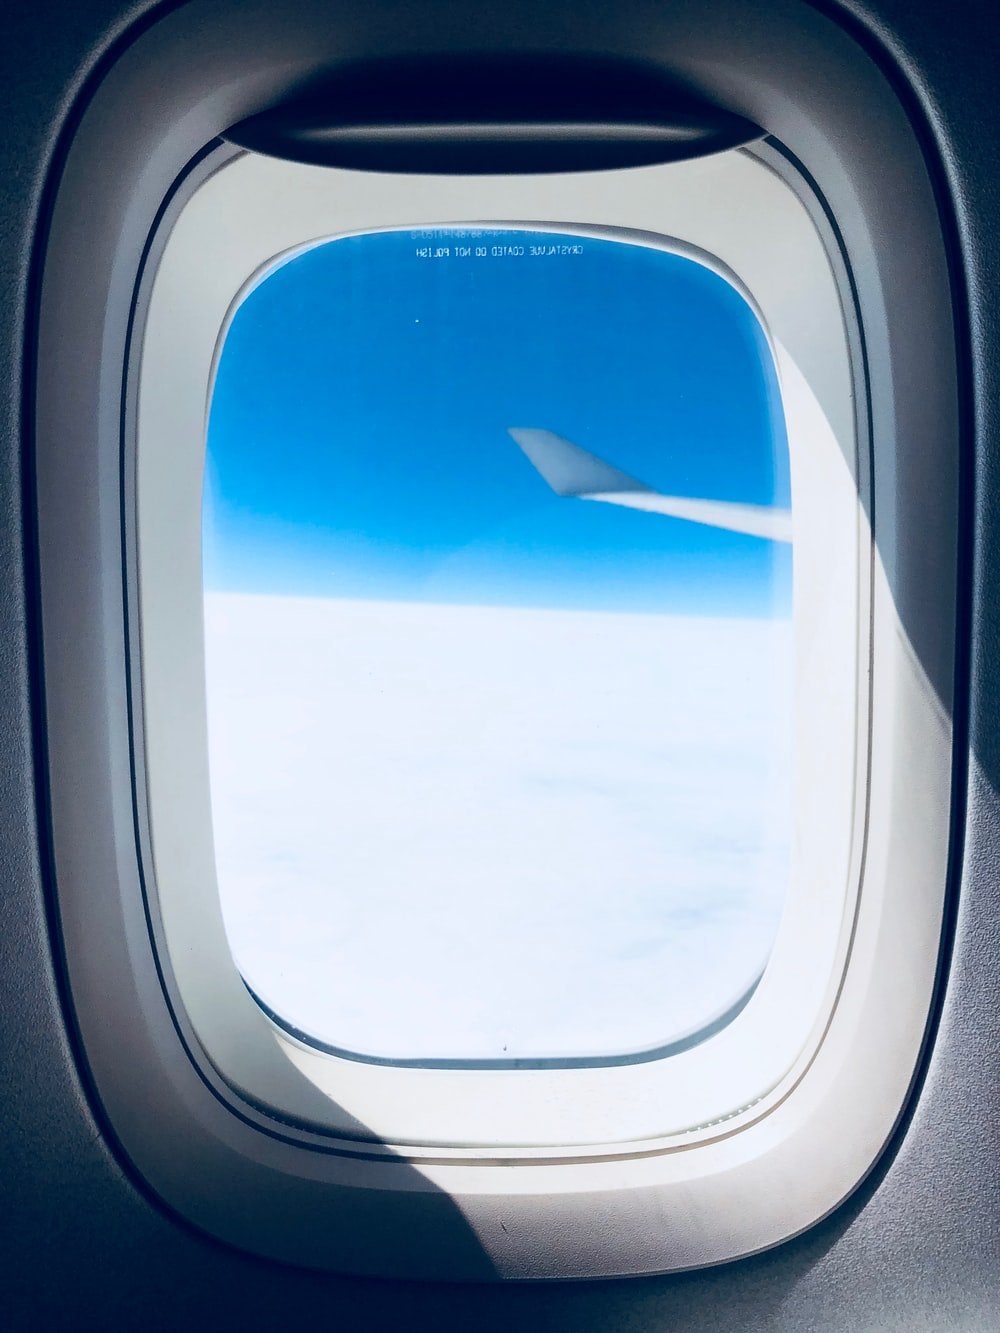 close-up photo of airplane window